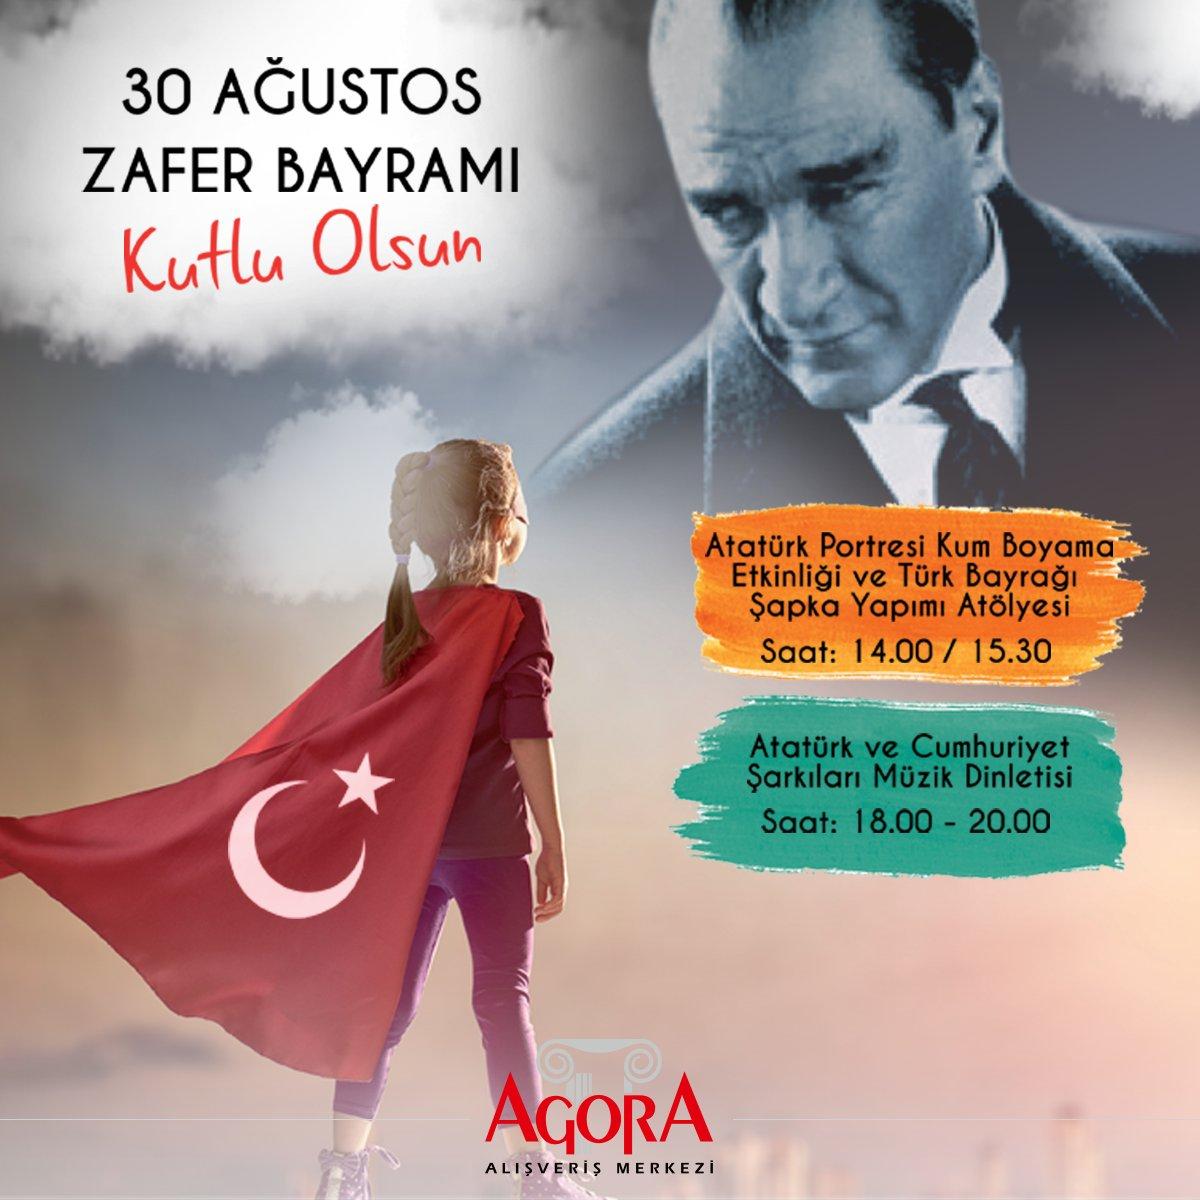 Agora Avm On Twitter 30 Ağustos Zafer Bayramı Coşkusu Agorada